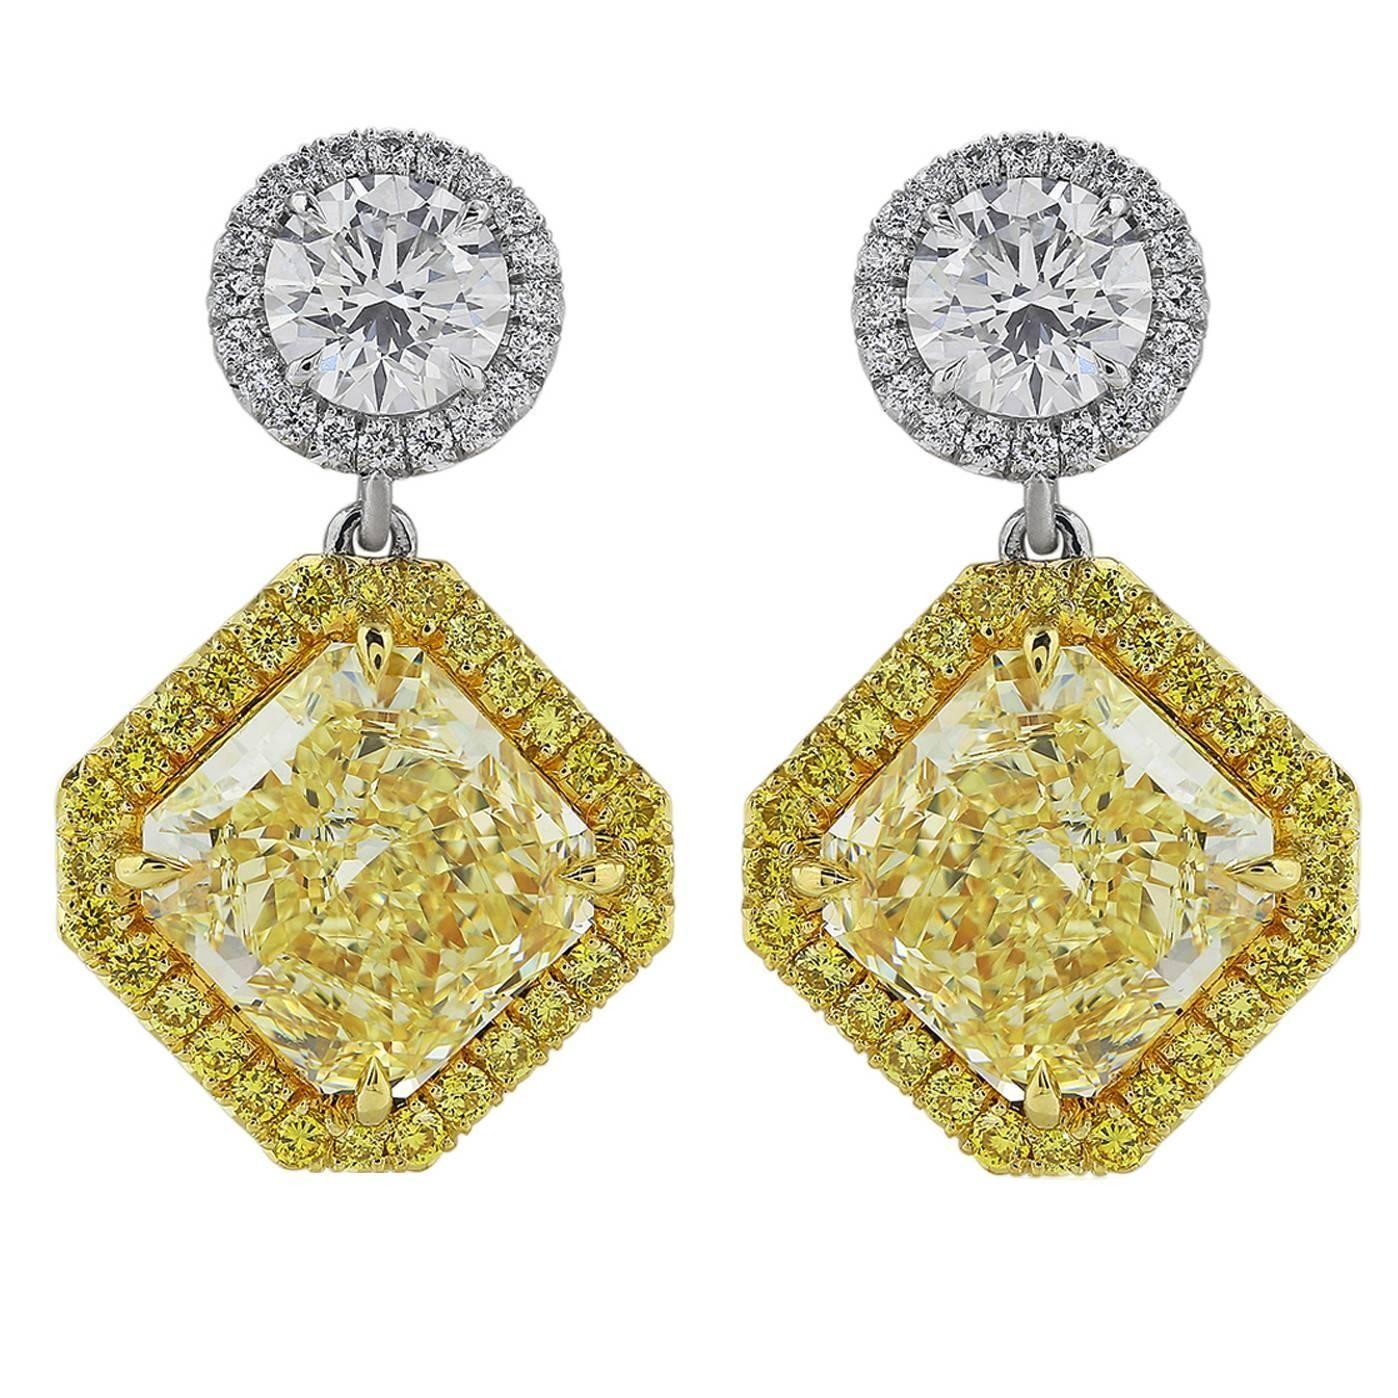 Custom Made 5 39 Carats Canary Diamonds Gold Platinum Drop Earrings 1stdibs Com Yellow Diamond Earring Drop Earrings Vintage Drop Earrings